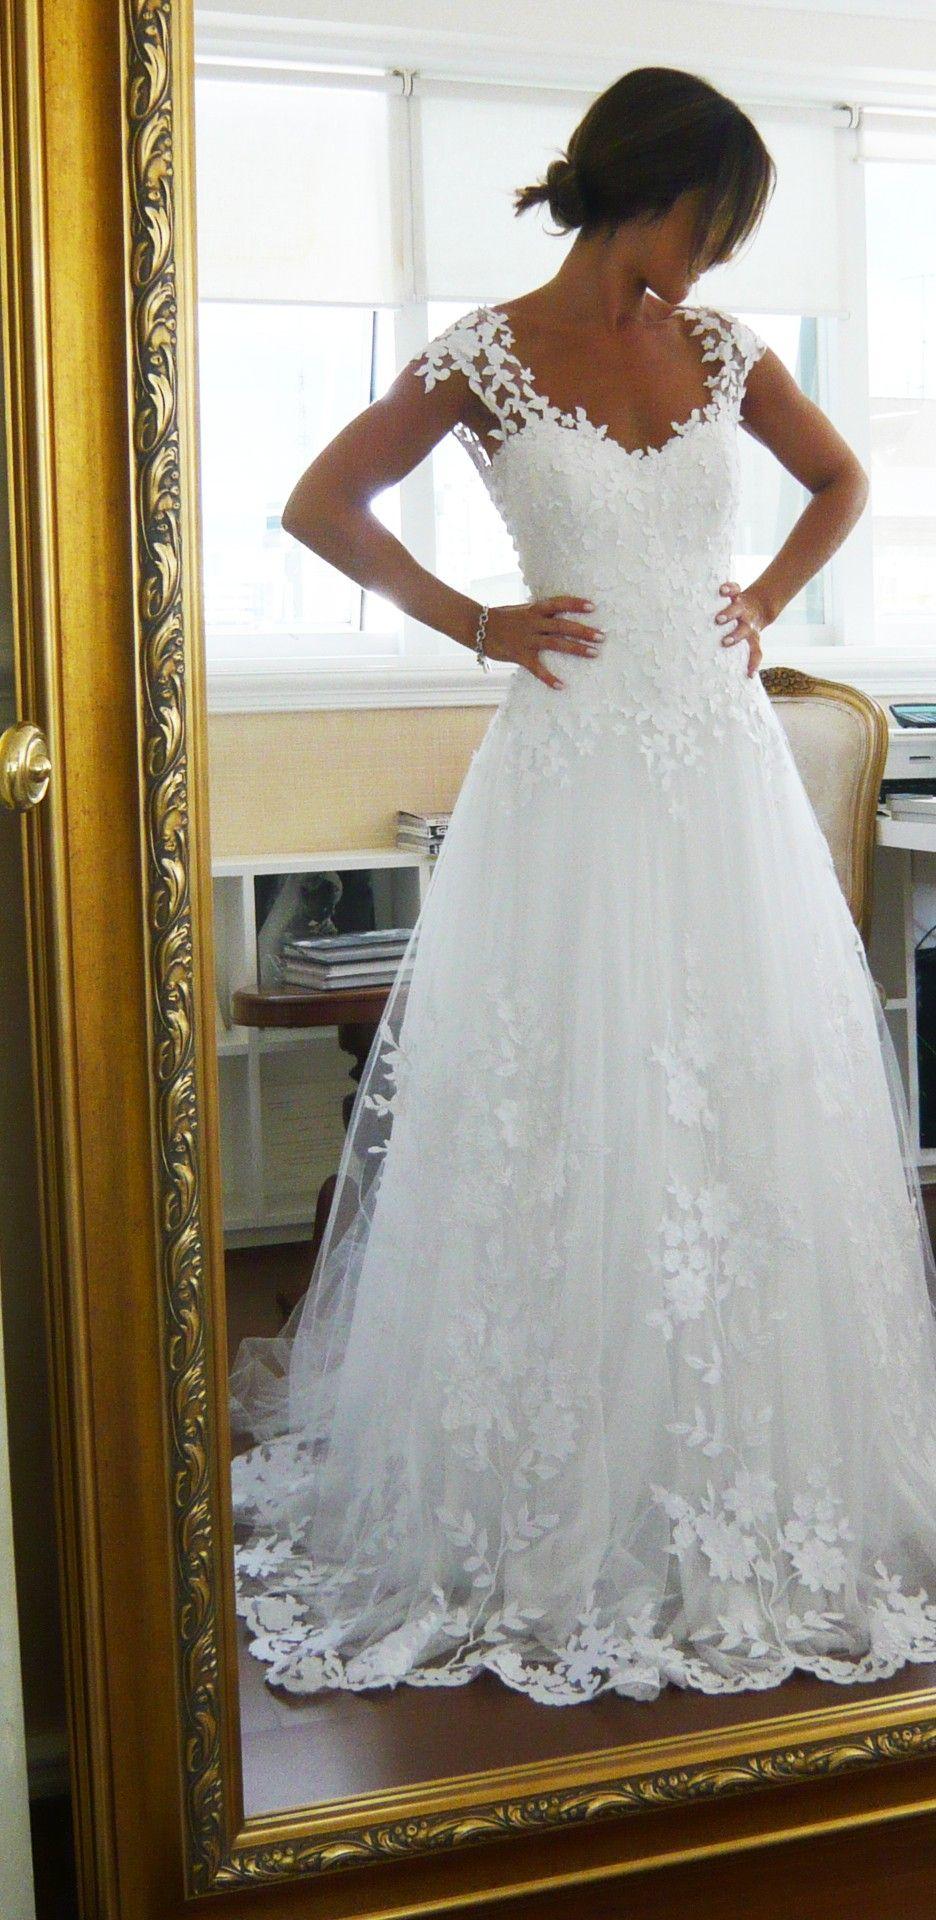 Maison kas vestidos de noiva wedding pinterest vestidos